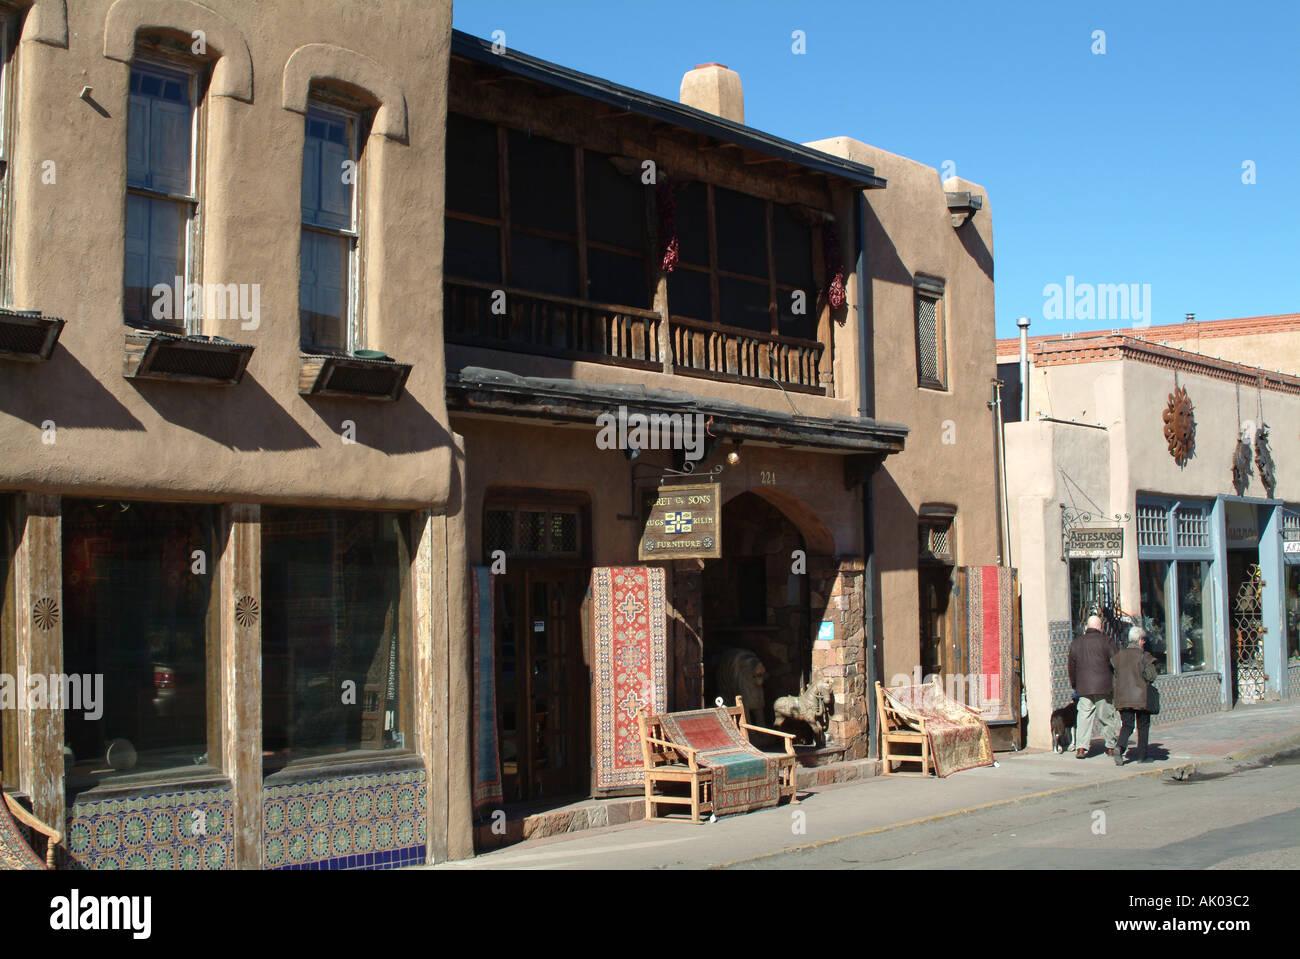 Furniture Store In Guadalupe Santa Fe New Mexico United States America USA